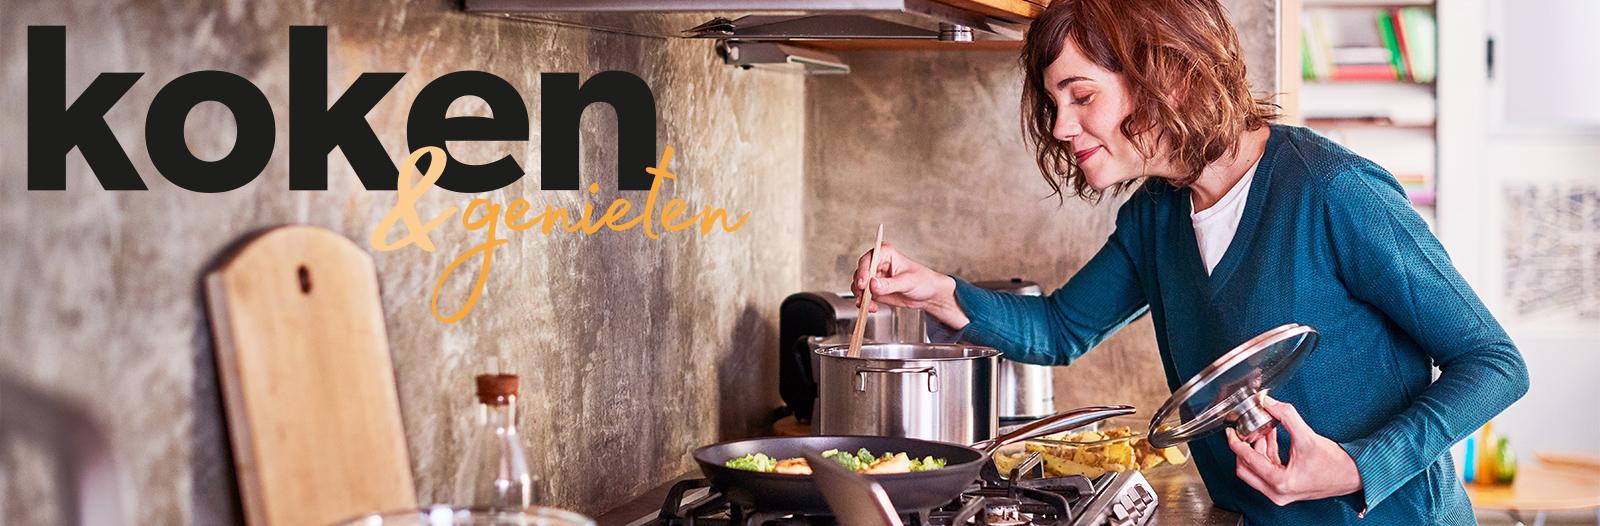 koken & genieten nabestellen